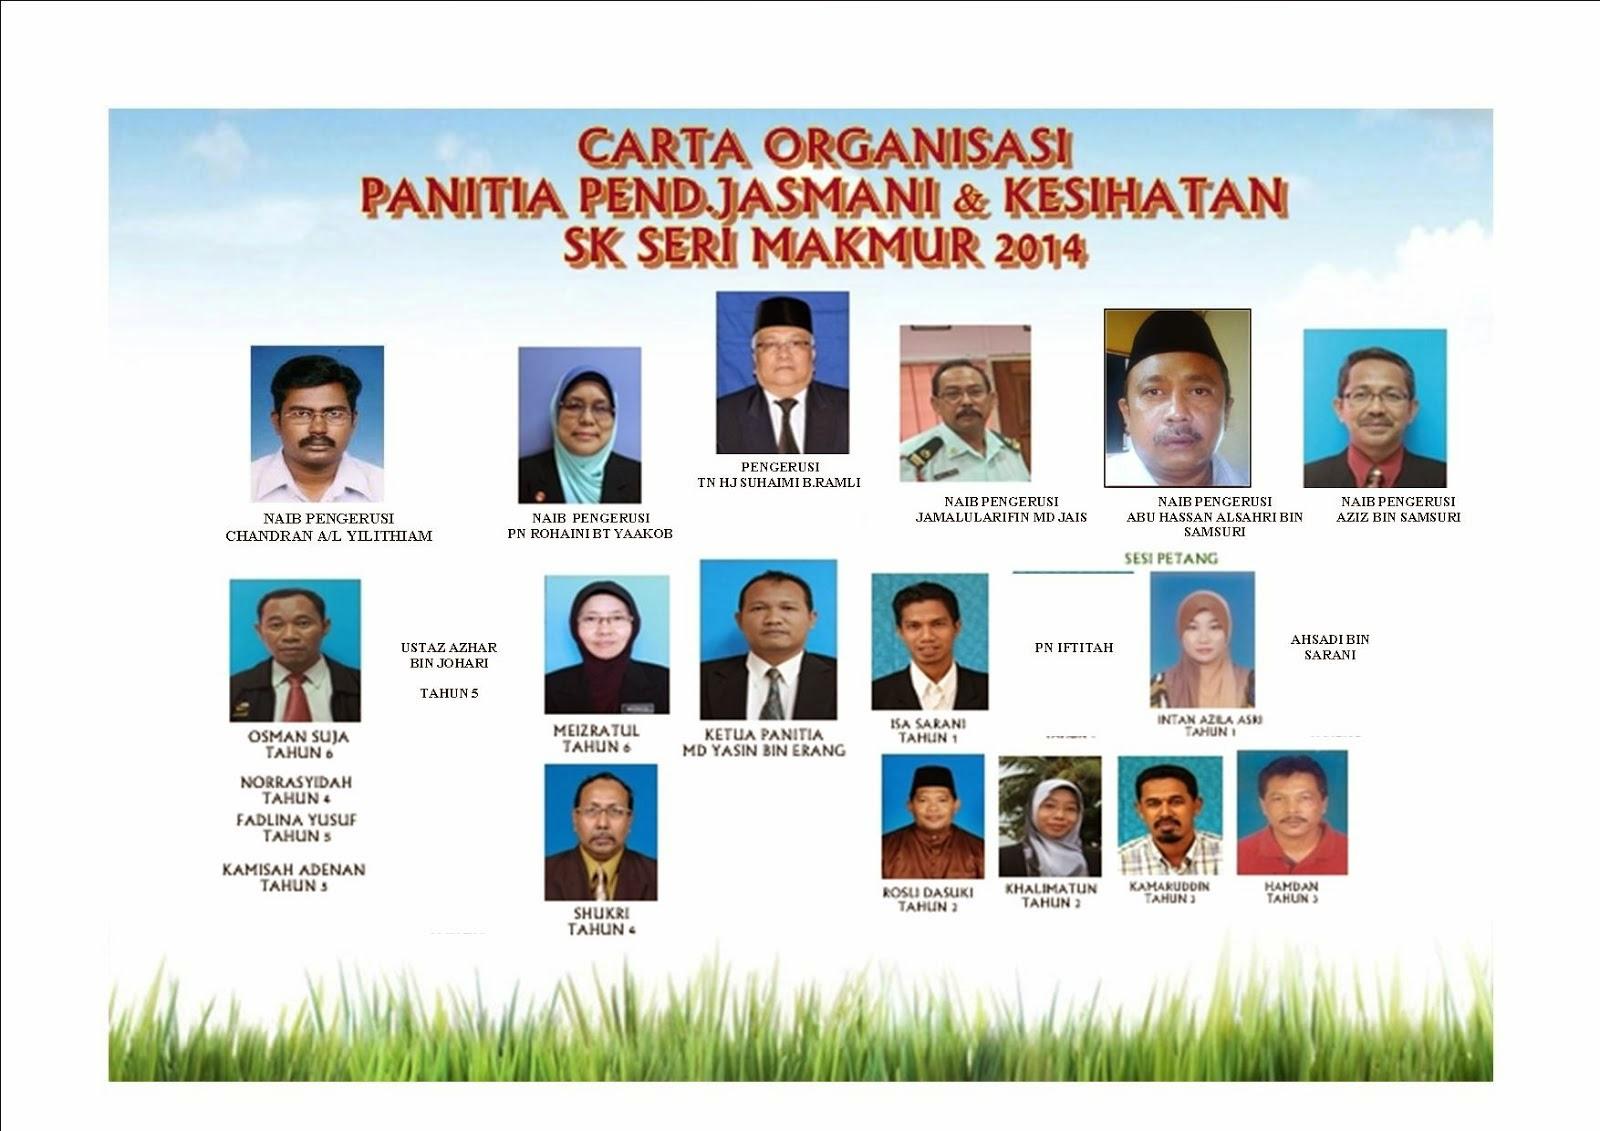 CARTA ORGANISASI PJPK 2014